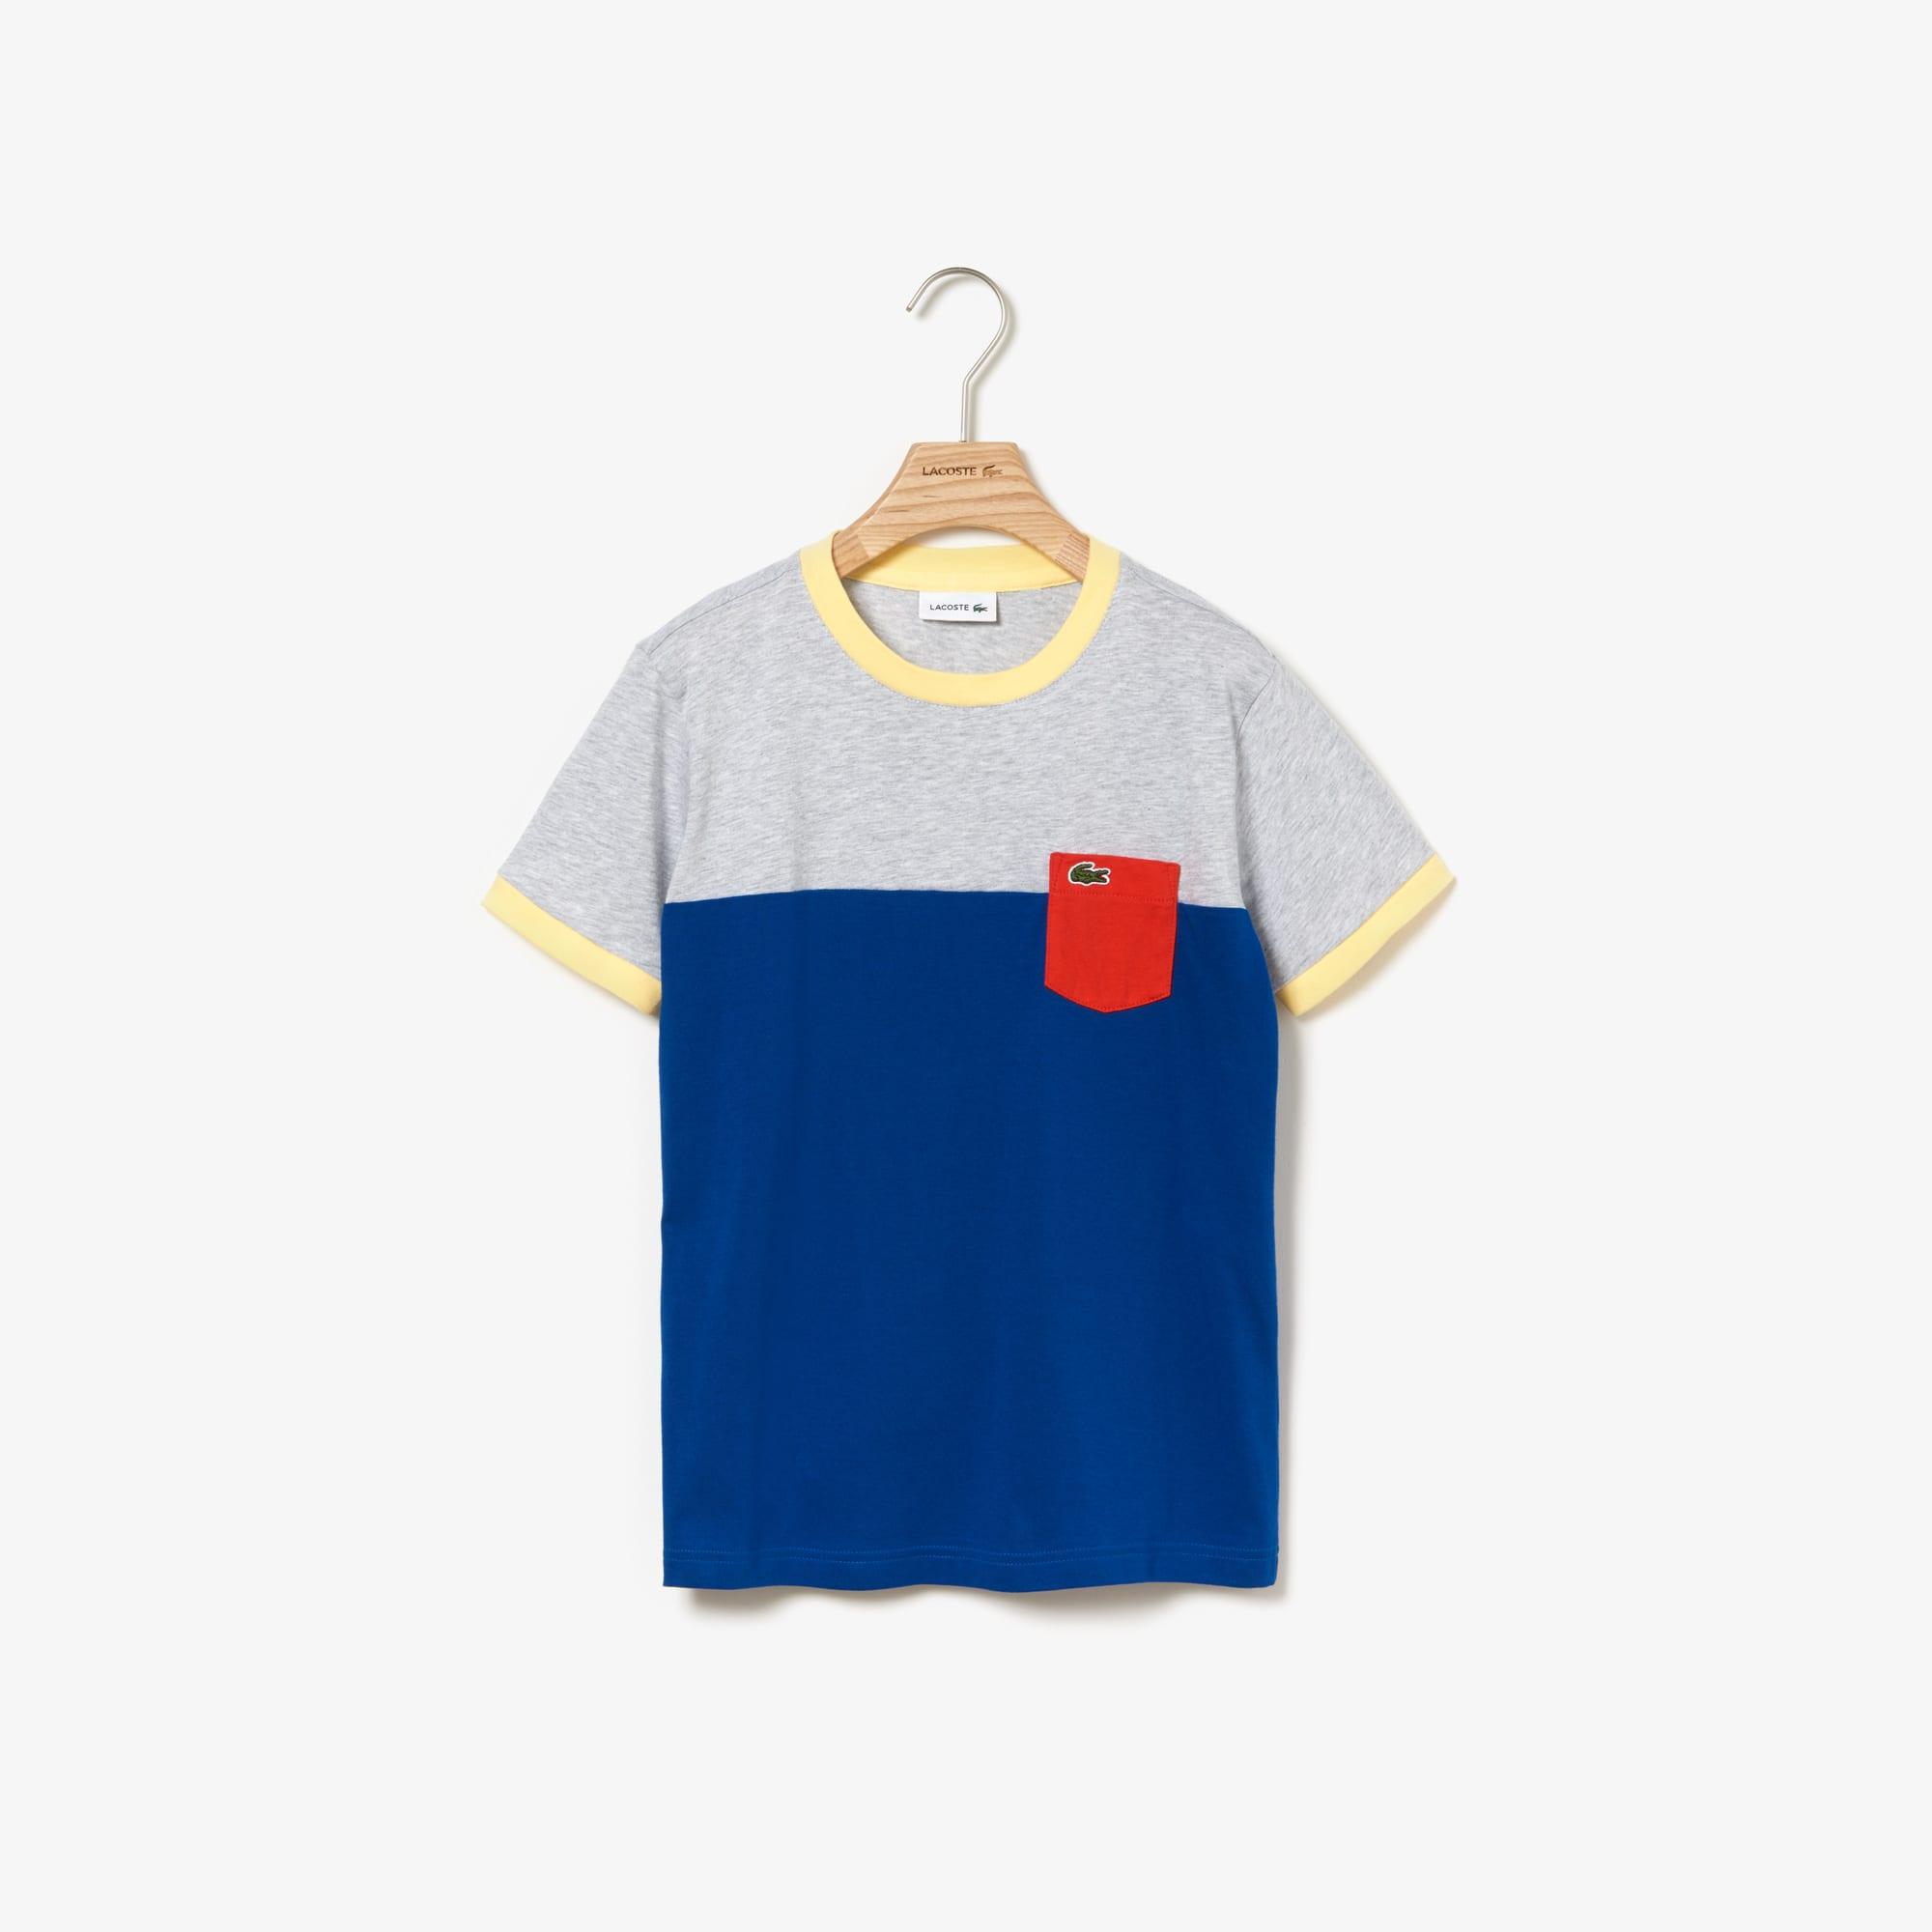 2284aa9115 Boys' Crew Neck Contrast Pocket Colourblock Cotton T-shirt